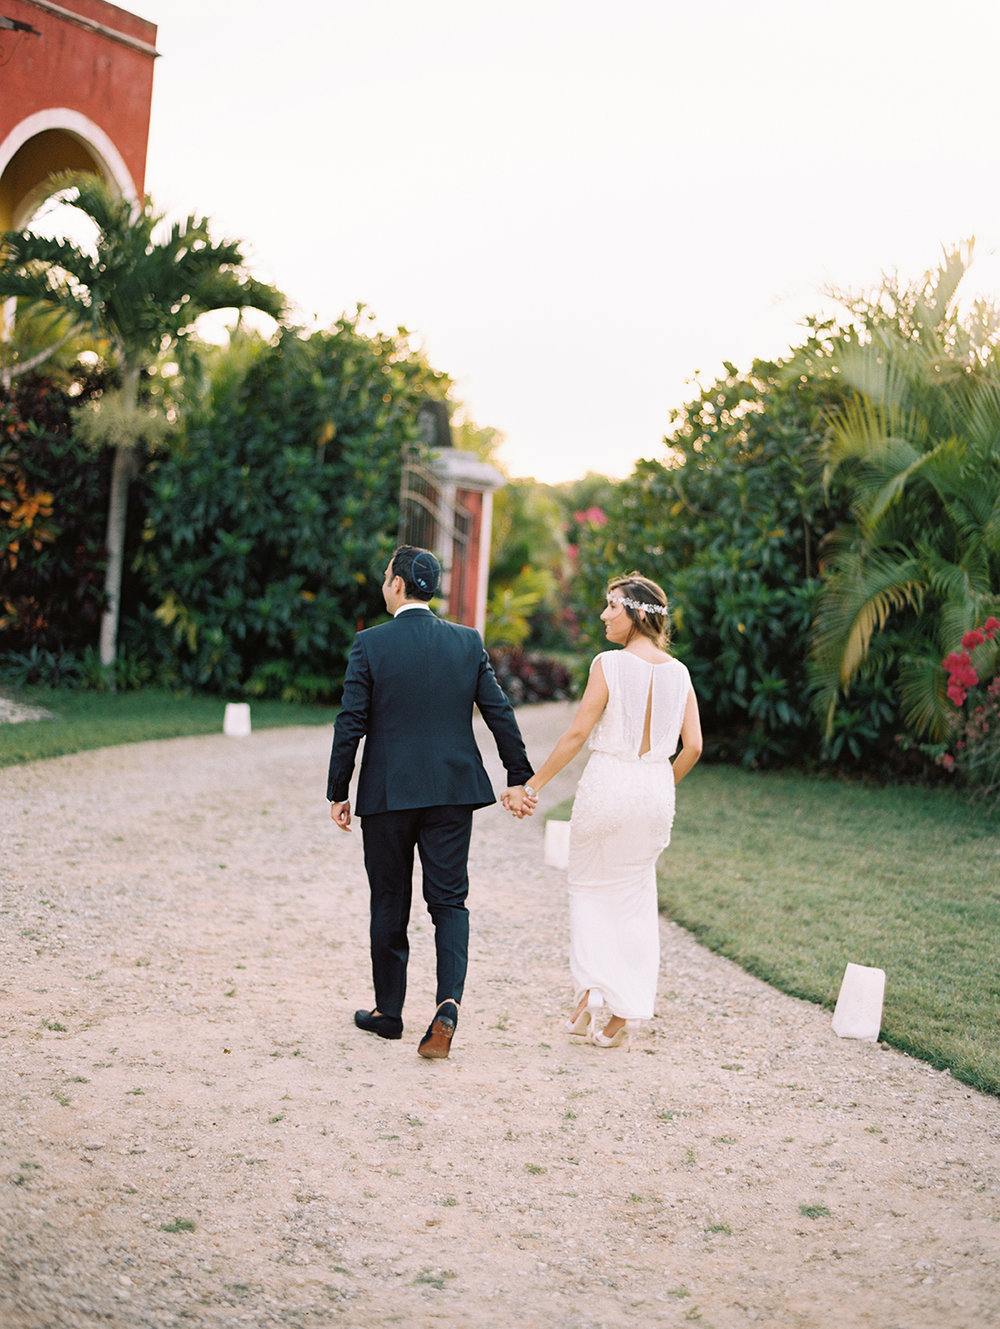 446_Dany+Sarah_Merida_Mexico_Wedding_Brumley & Wells_Fine_art_film_photography.jpg